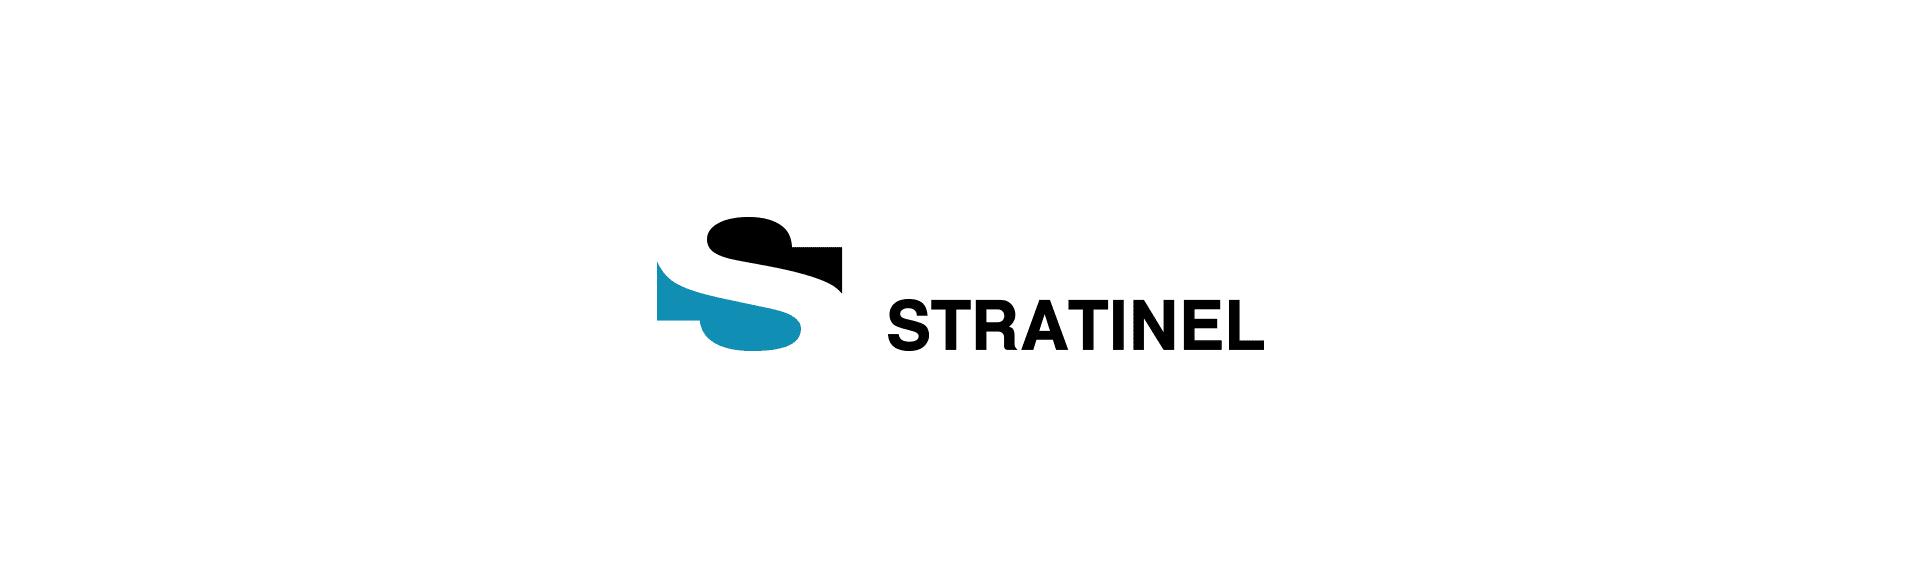 Stratinel logo design - engineering company